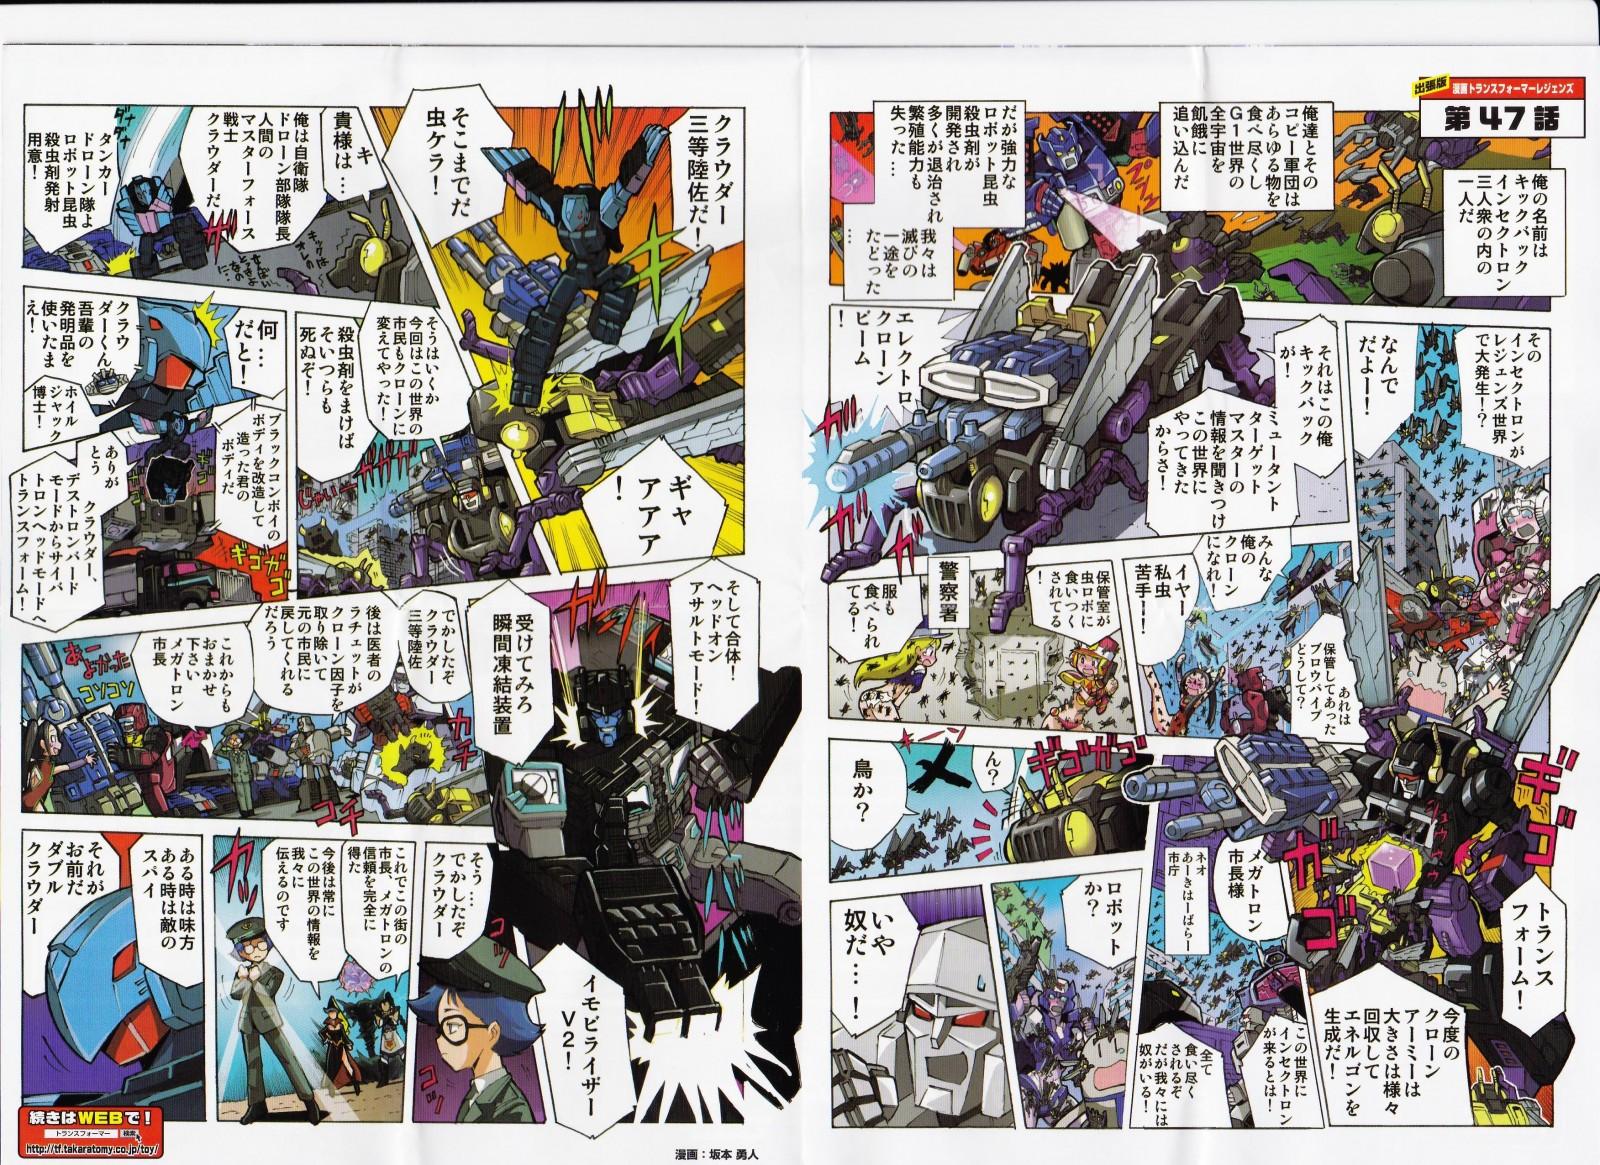 Transformers News: Scans of Pack In Comics and Bios for Takara Legends LG47 Kickback, LG48 Brawn & LG49 Triggerhappy